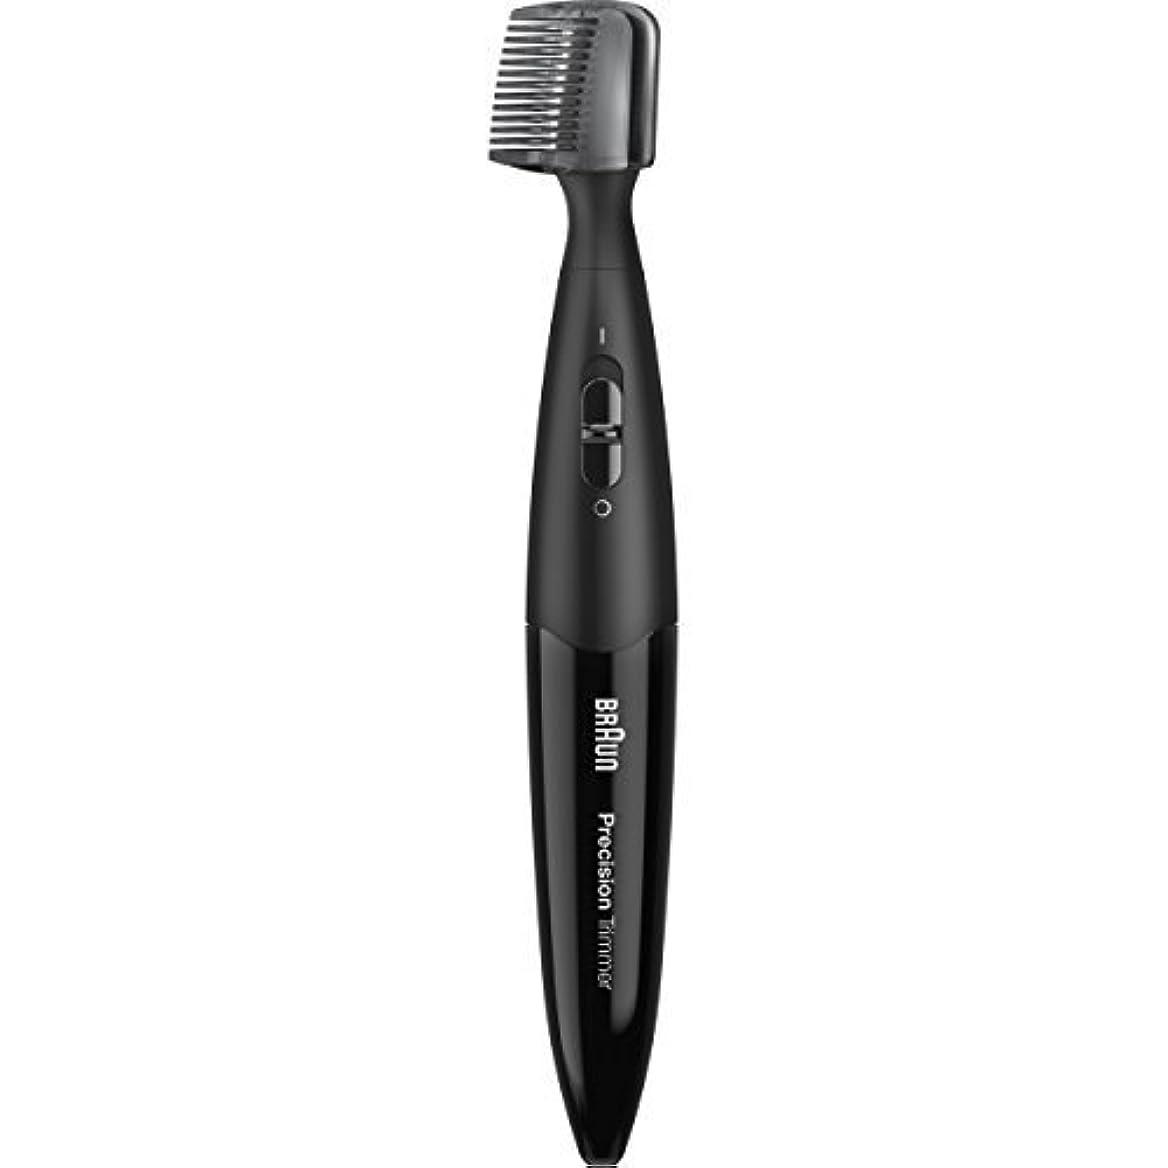 移植桁連邦Braun Precision Trimmer PT5010, Men's Precision Beard, Ear & Nose, Mustache detailer, styler [並行輸入品]